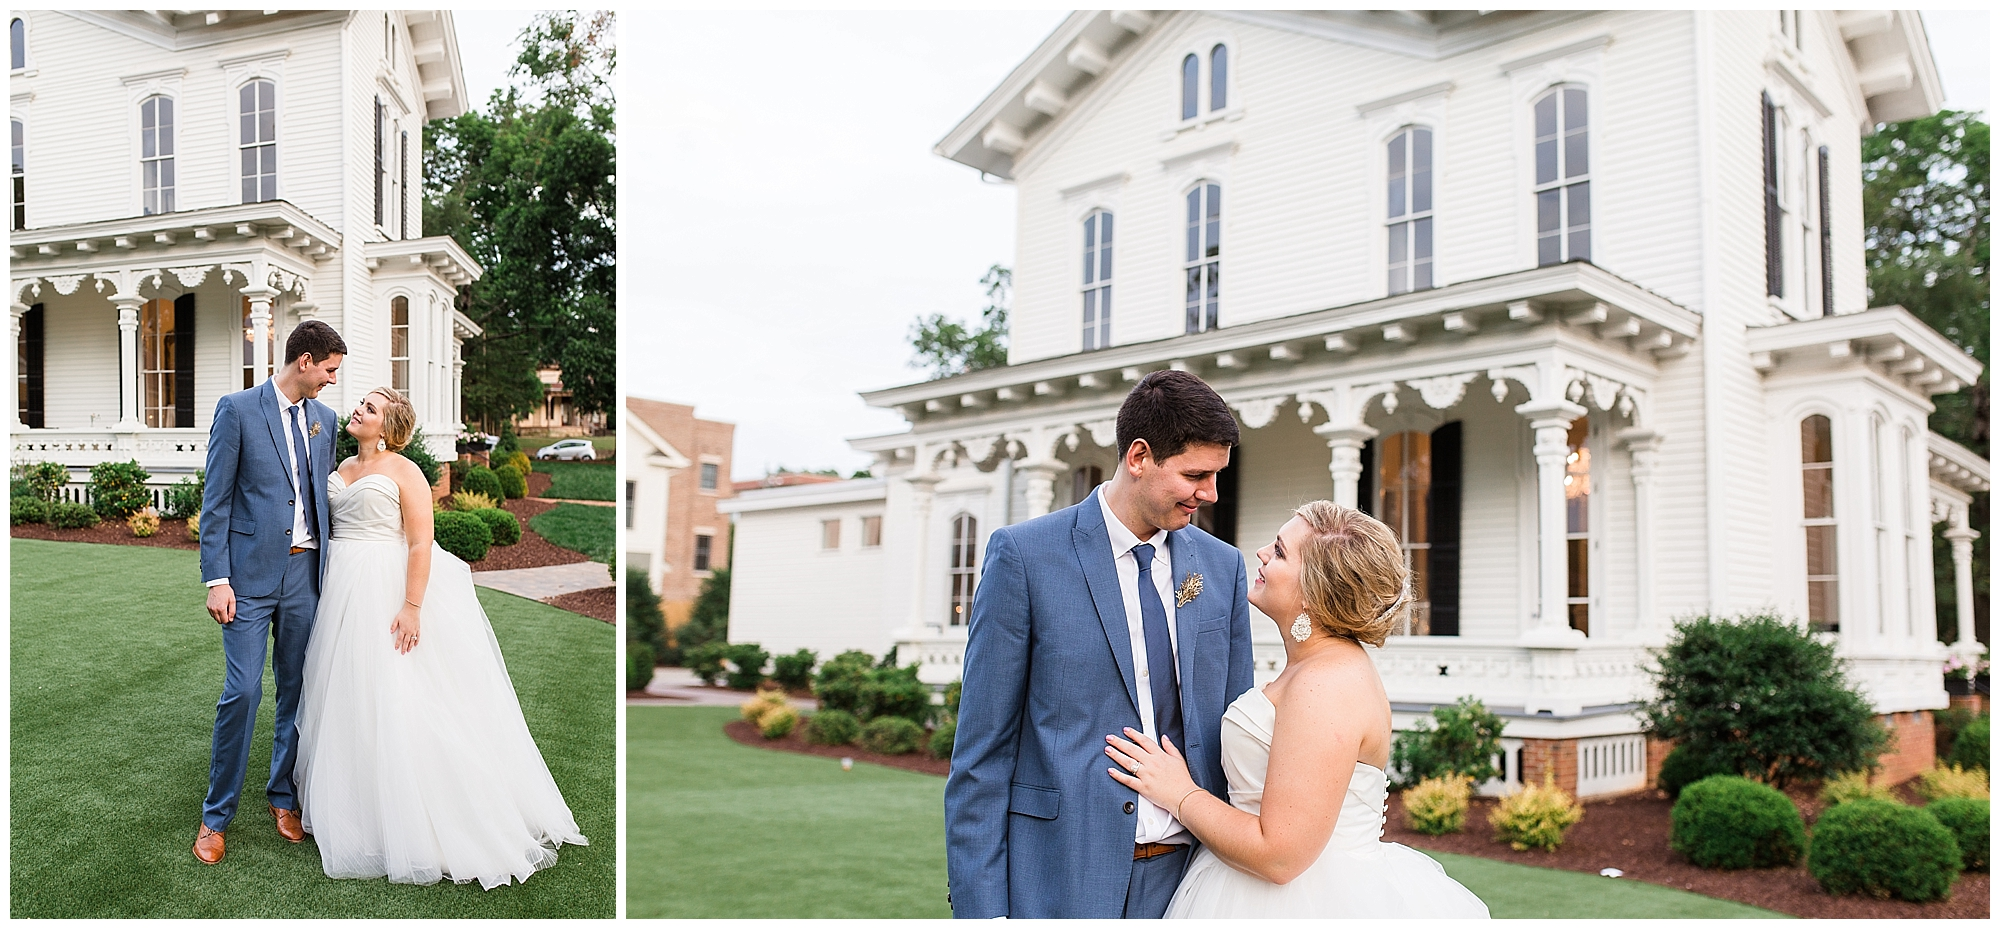 Merrimon-Wynne-Raleigh-Wedding-20.jpg